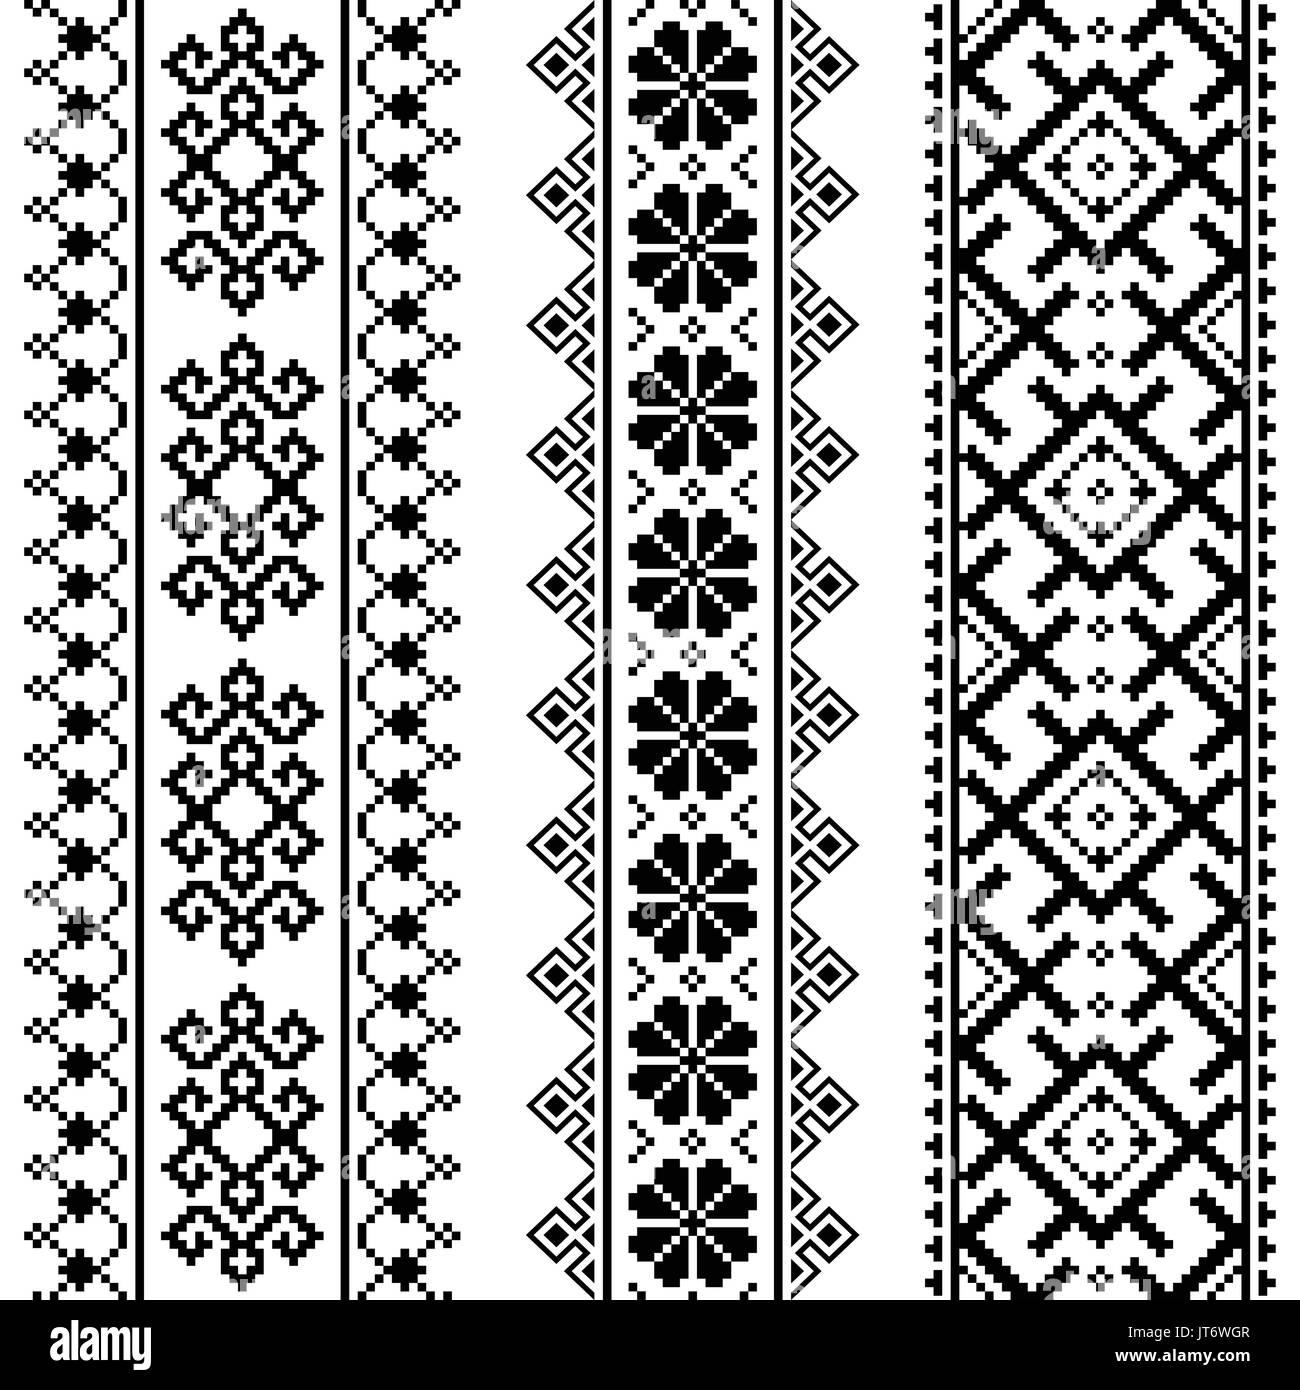 Ucraniano, Bielorruso bordado negro - Vyshyvanka patrón perfecta ...